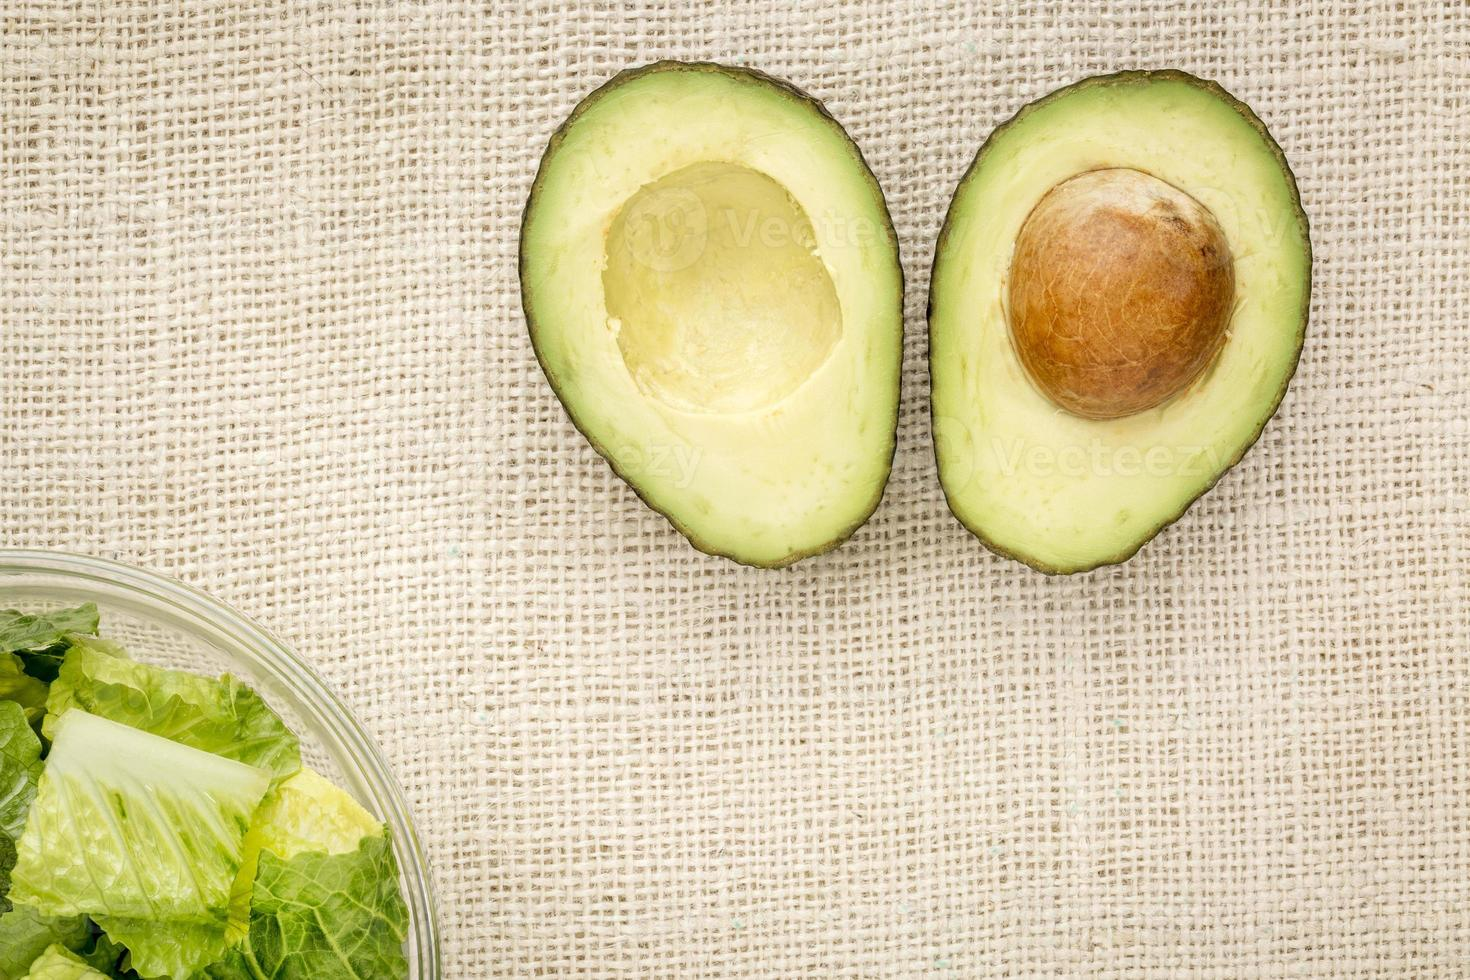 halved avocado and lettuce photo